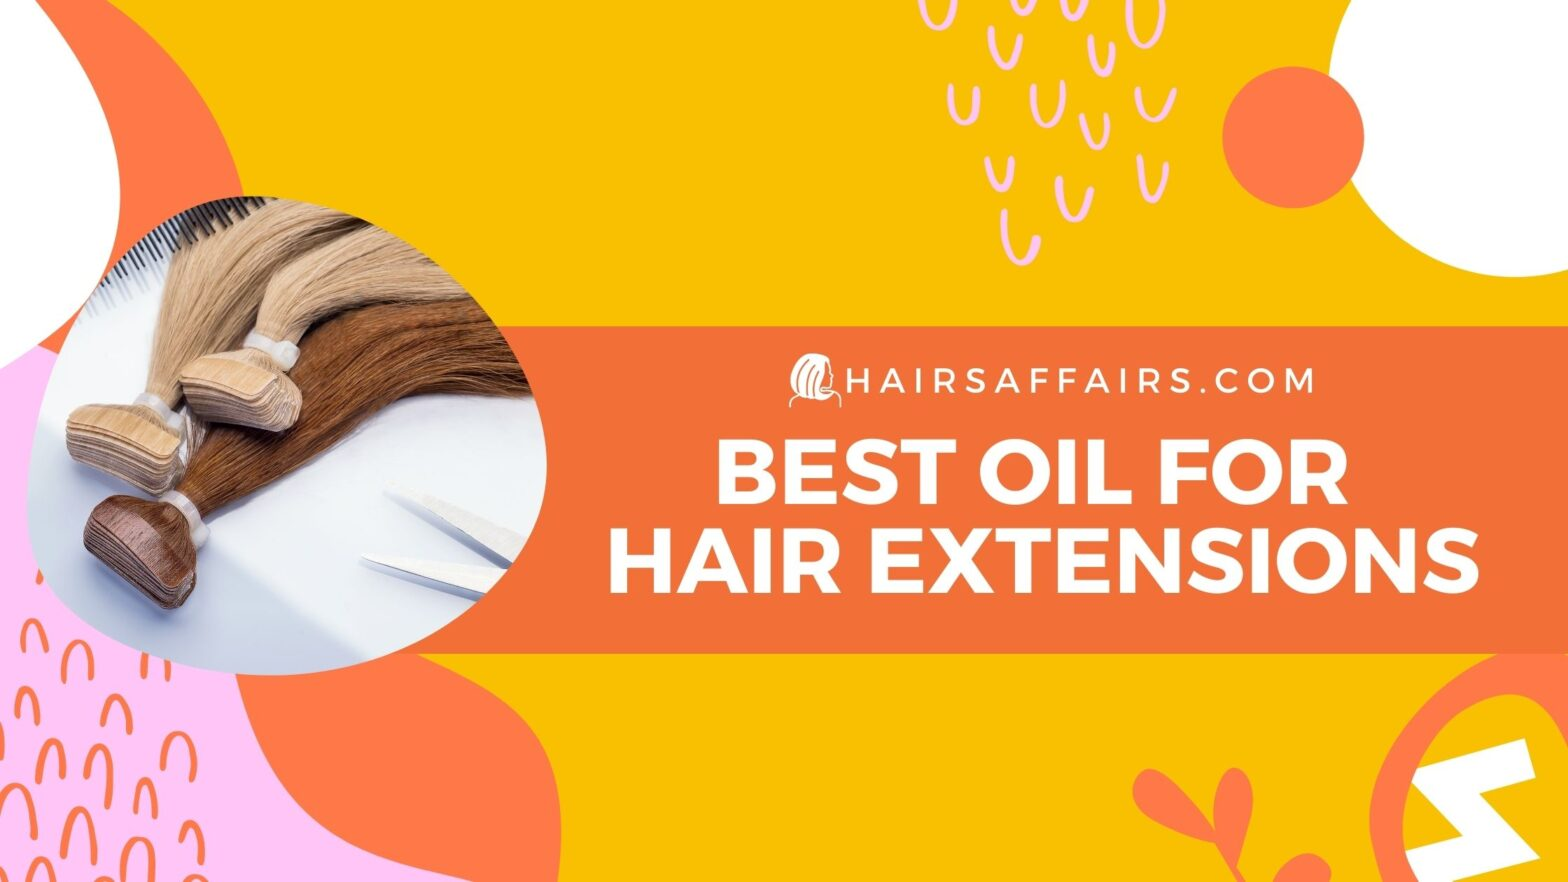 HA-Best-oil-for-hair-extensions